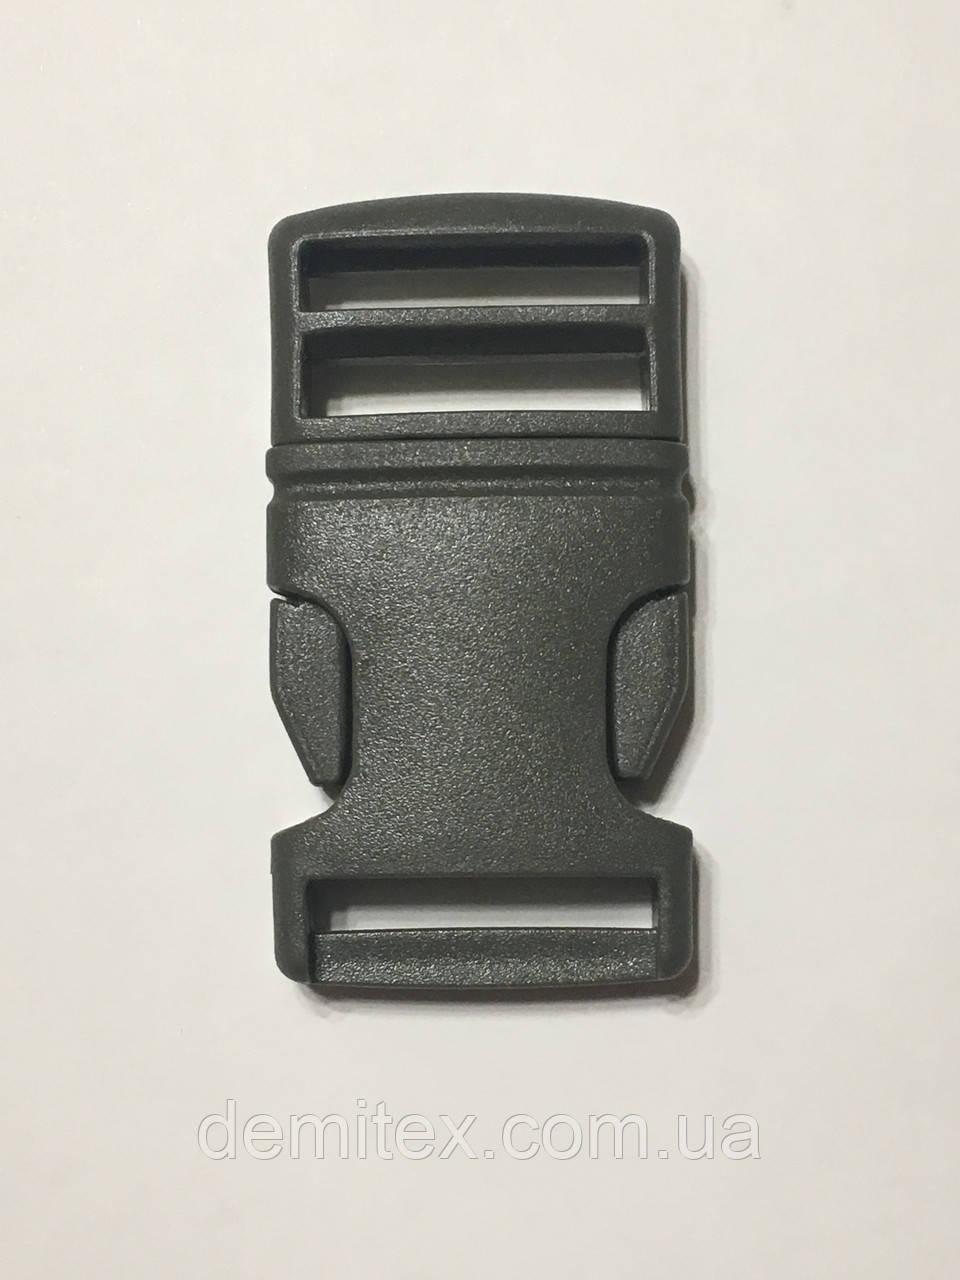 Фастекс хакки 25 мм